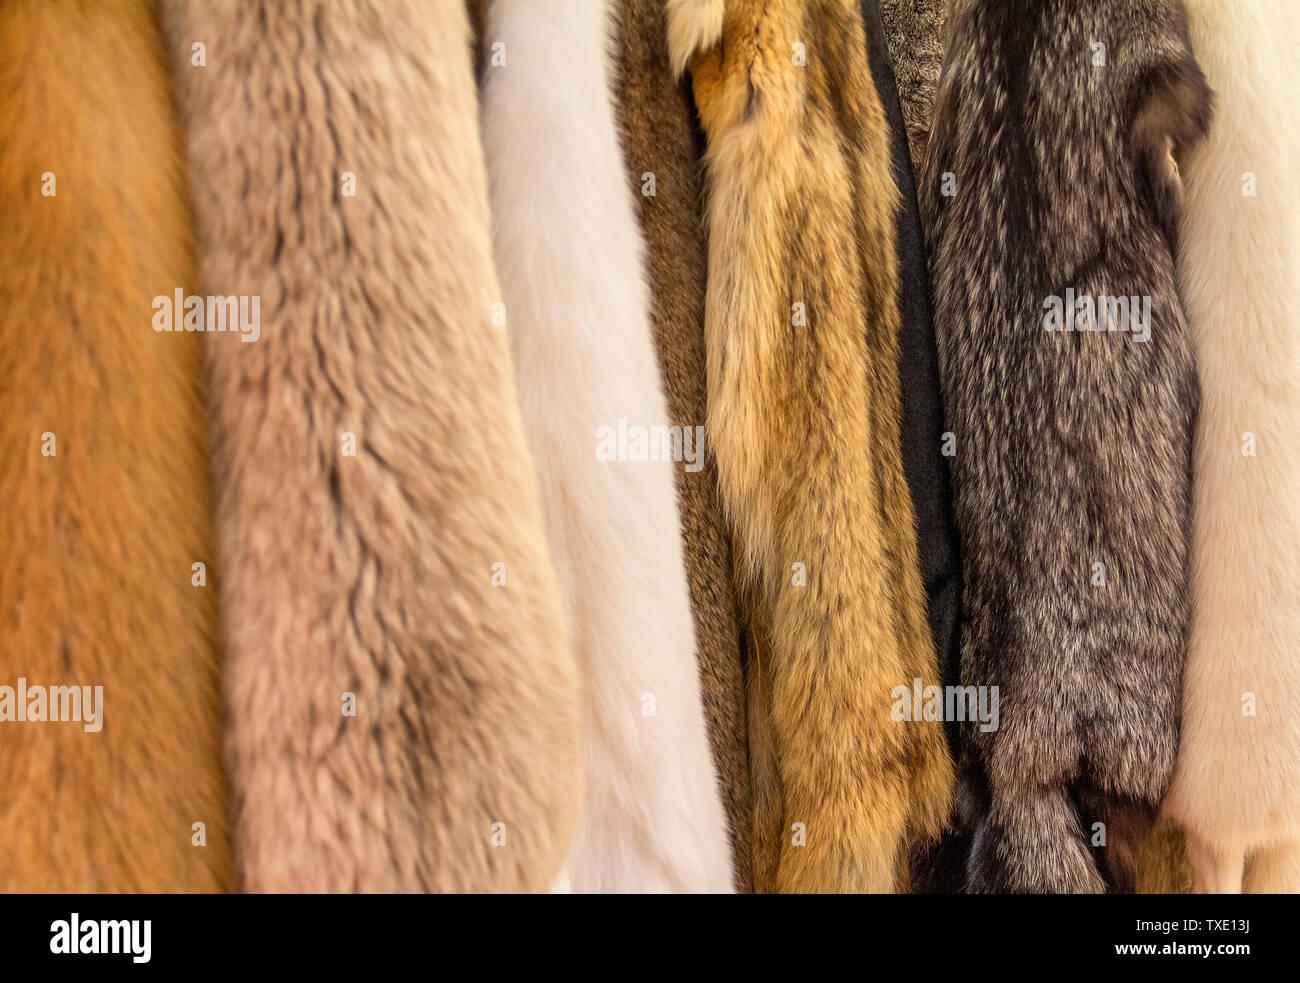 various hanging fur pieces seen at a medieval market - Stock Image